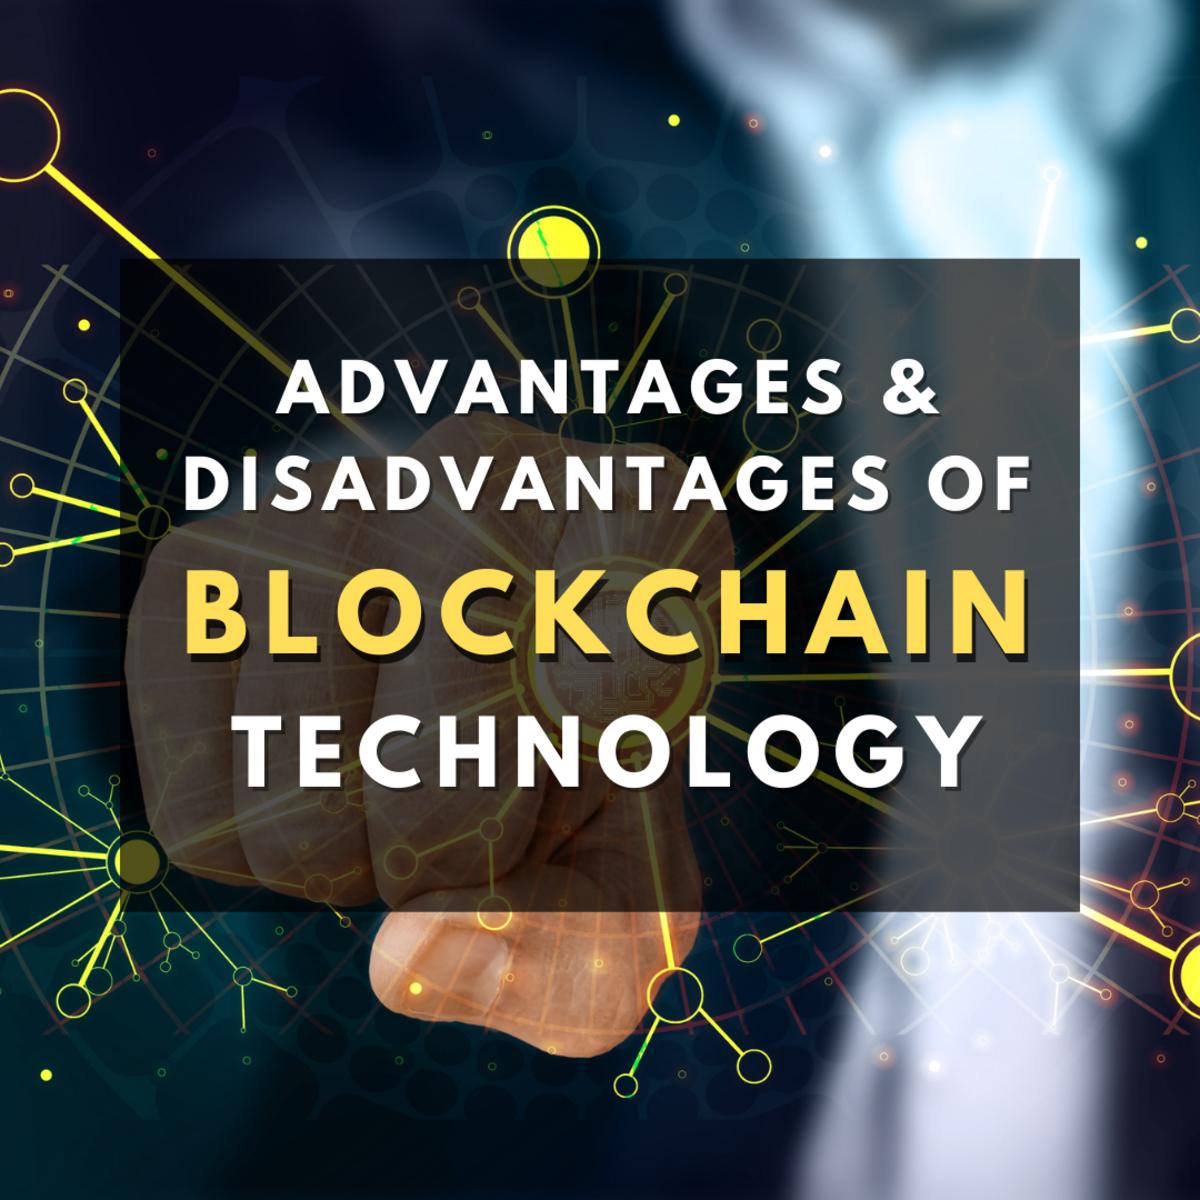 advantages-and-disadvantages-of-blockchain-technology